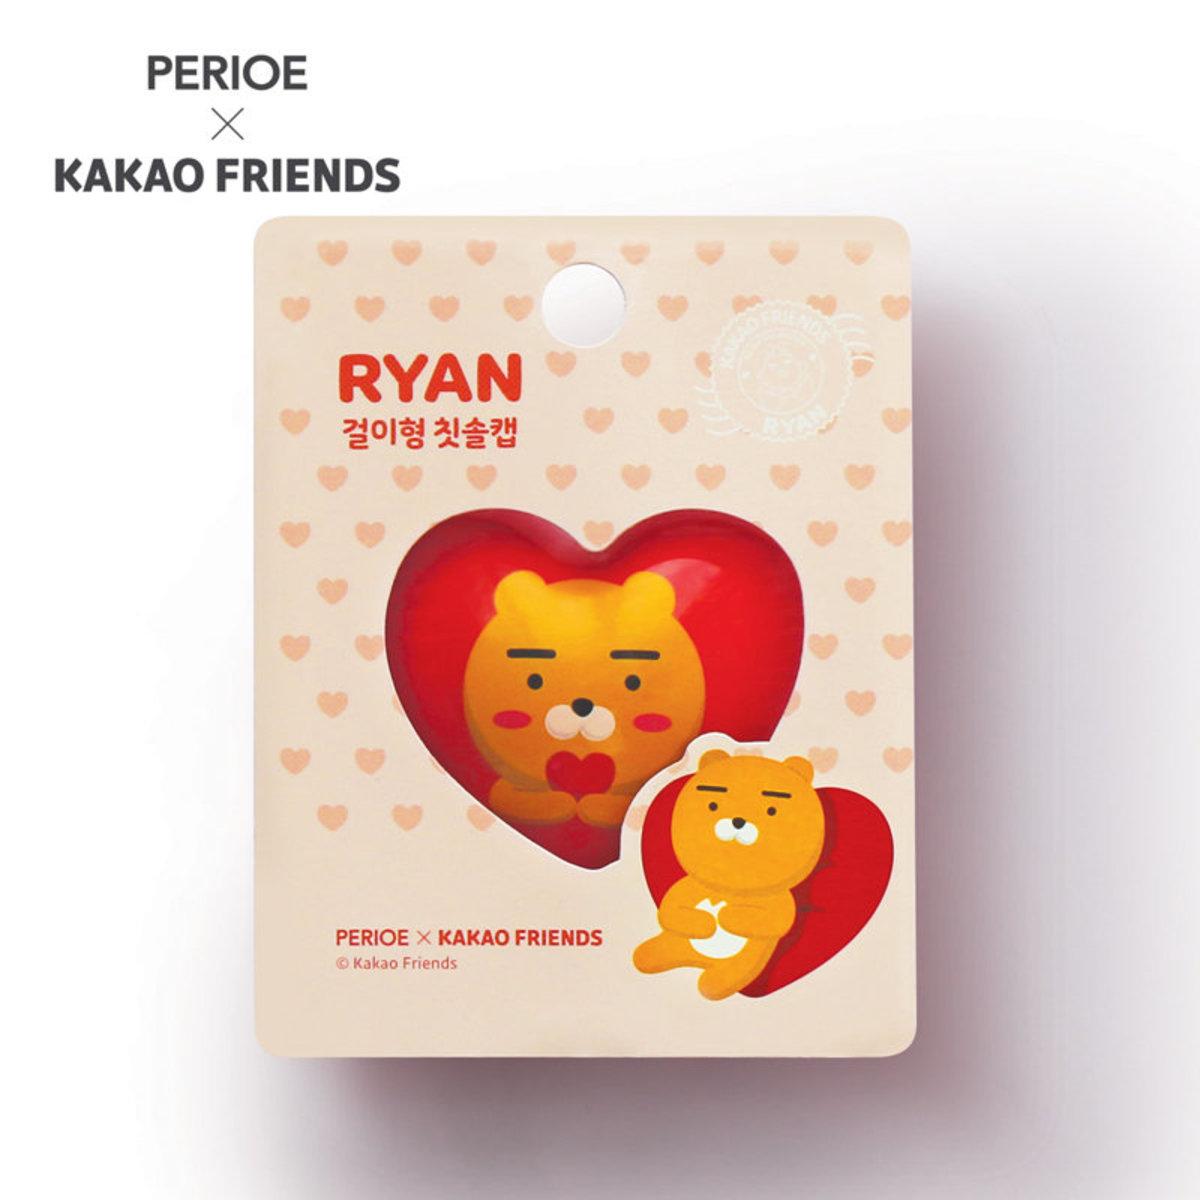 KaKao Friends 超幼細刷毛牙刷掛鉤 (Ryan Love )